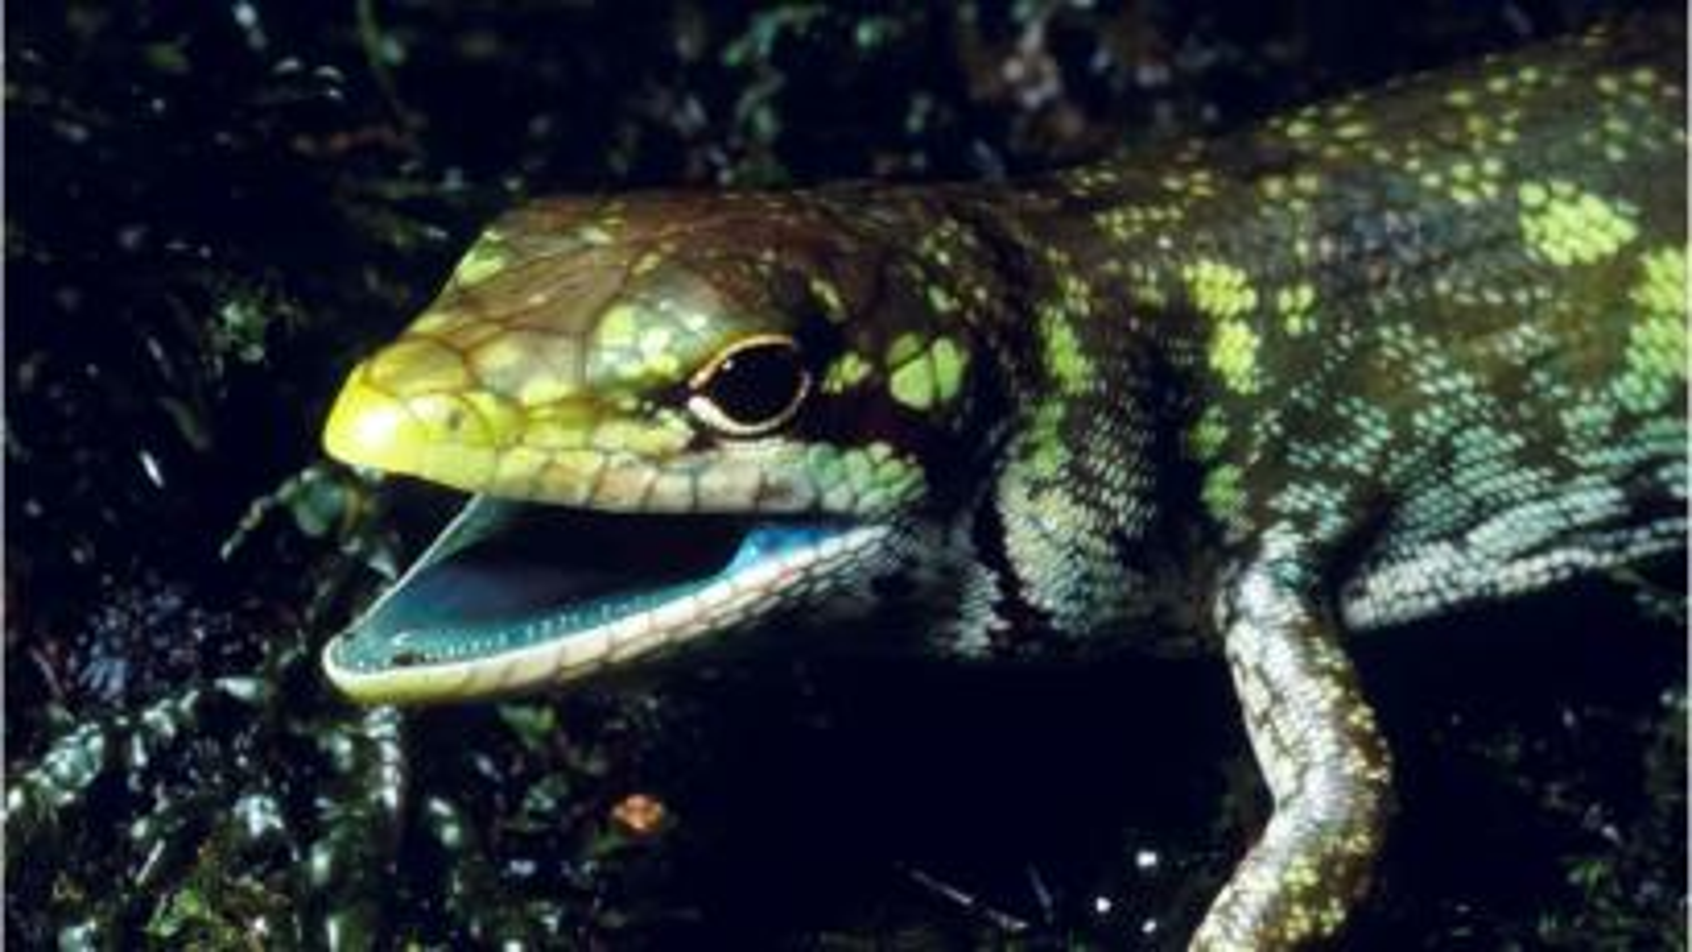 Green-blooded lizard.